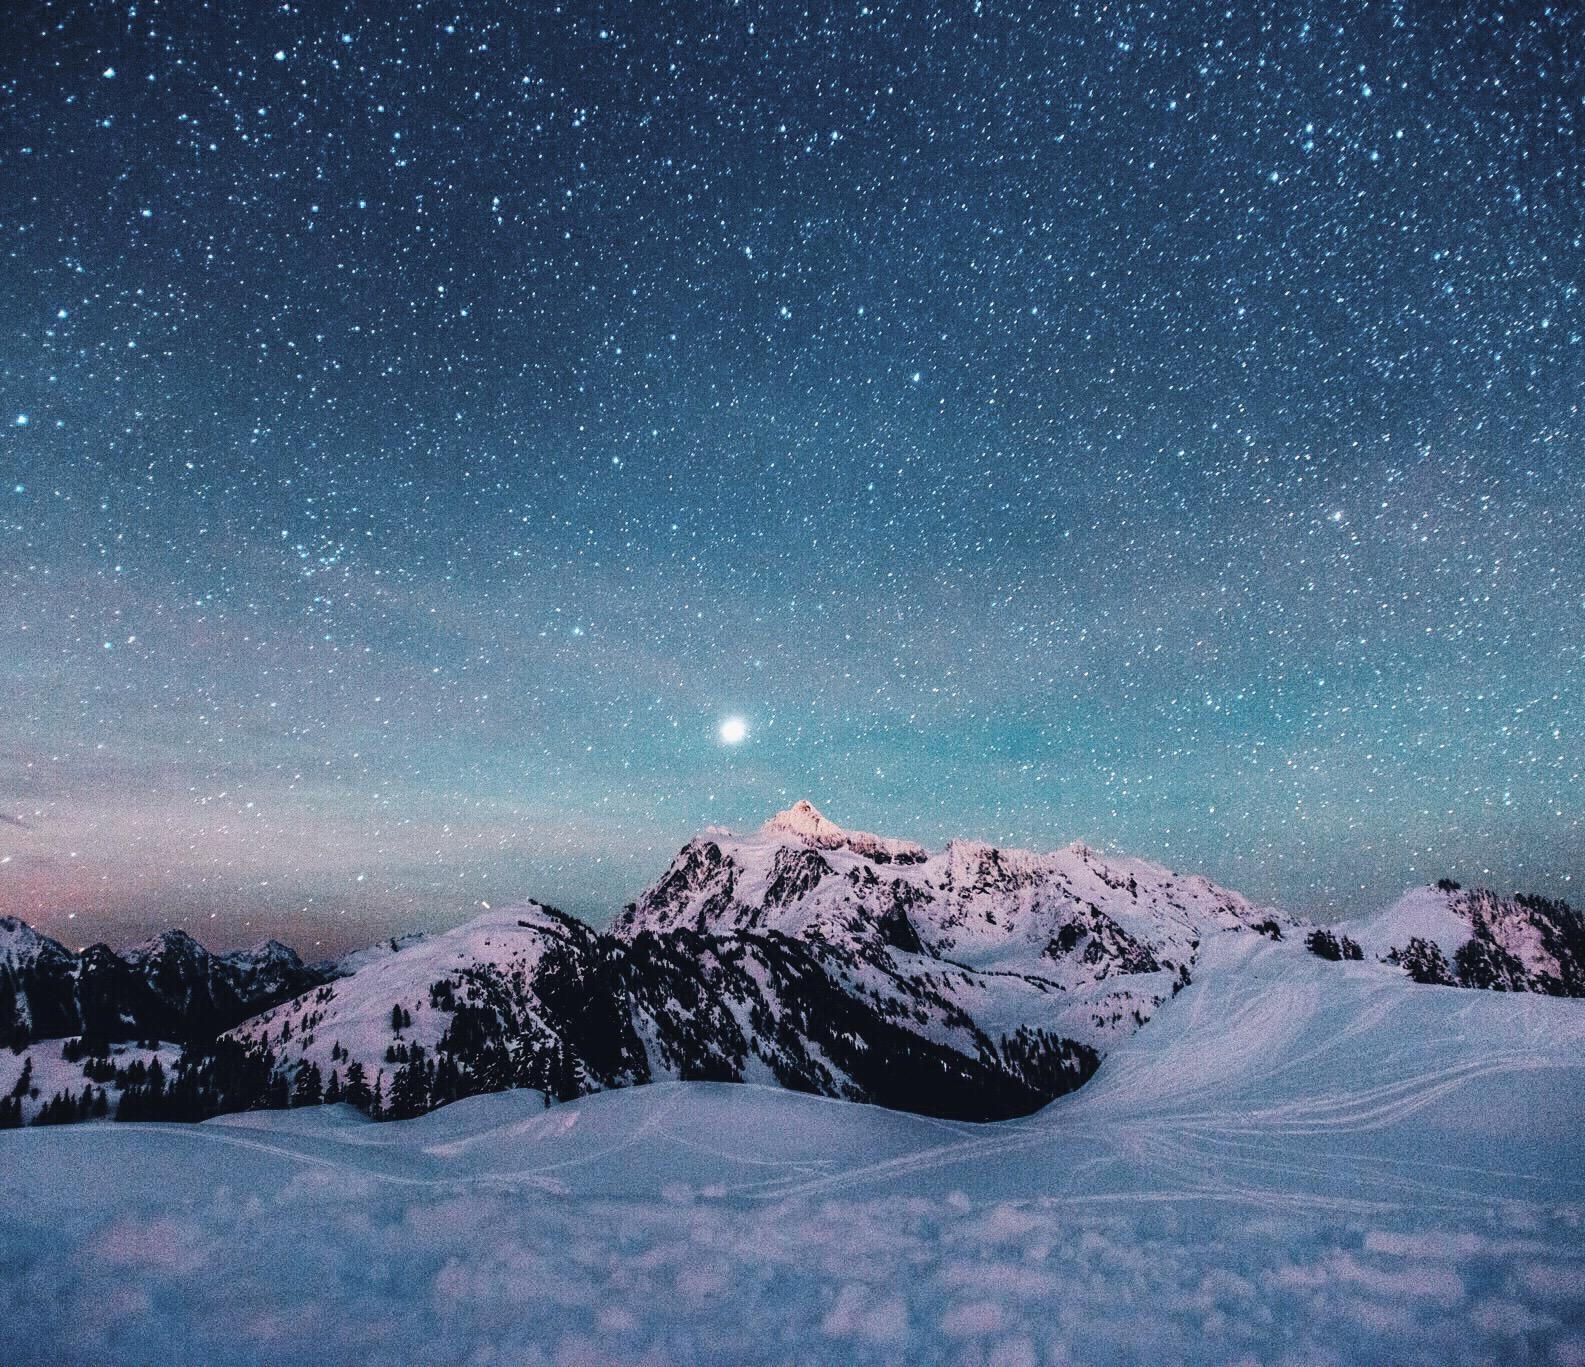 Mt. Shuksan at around midnight